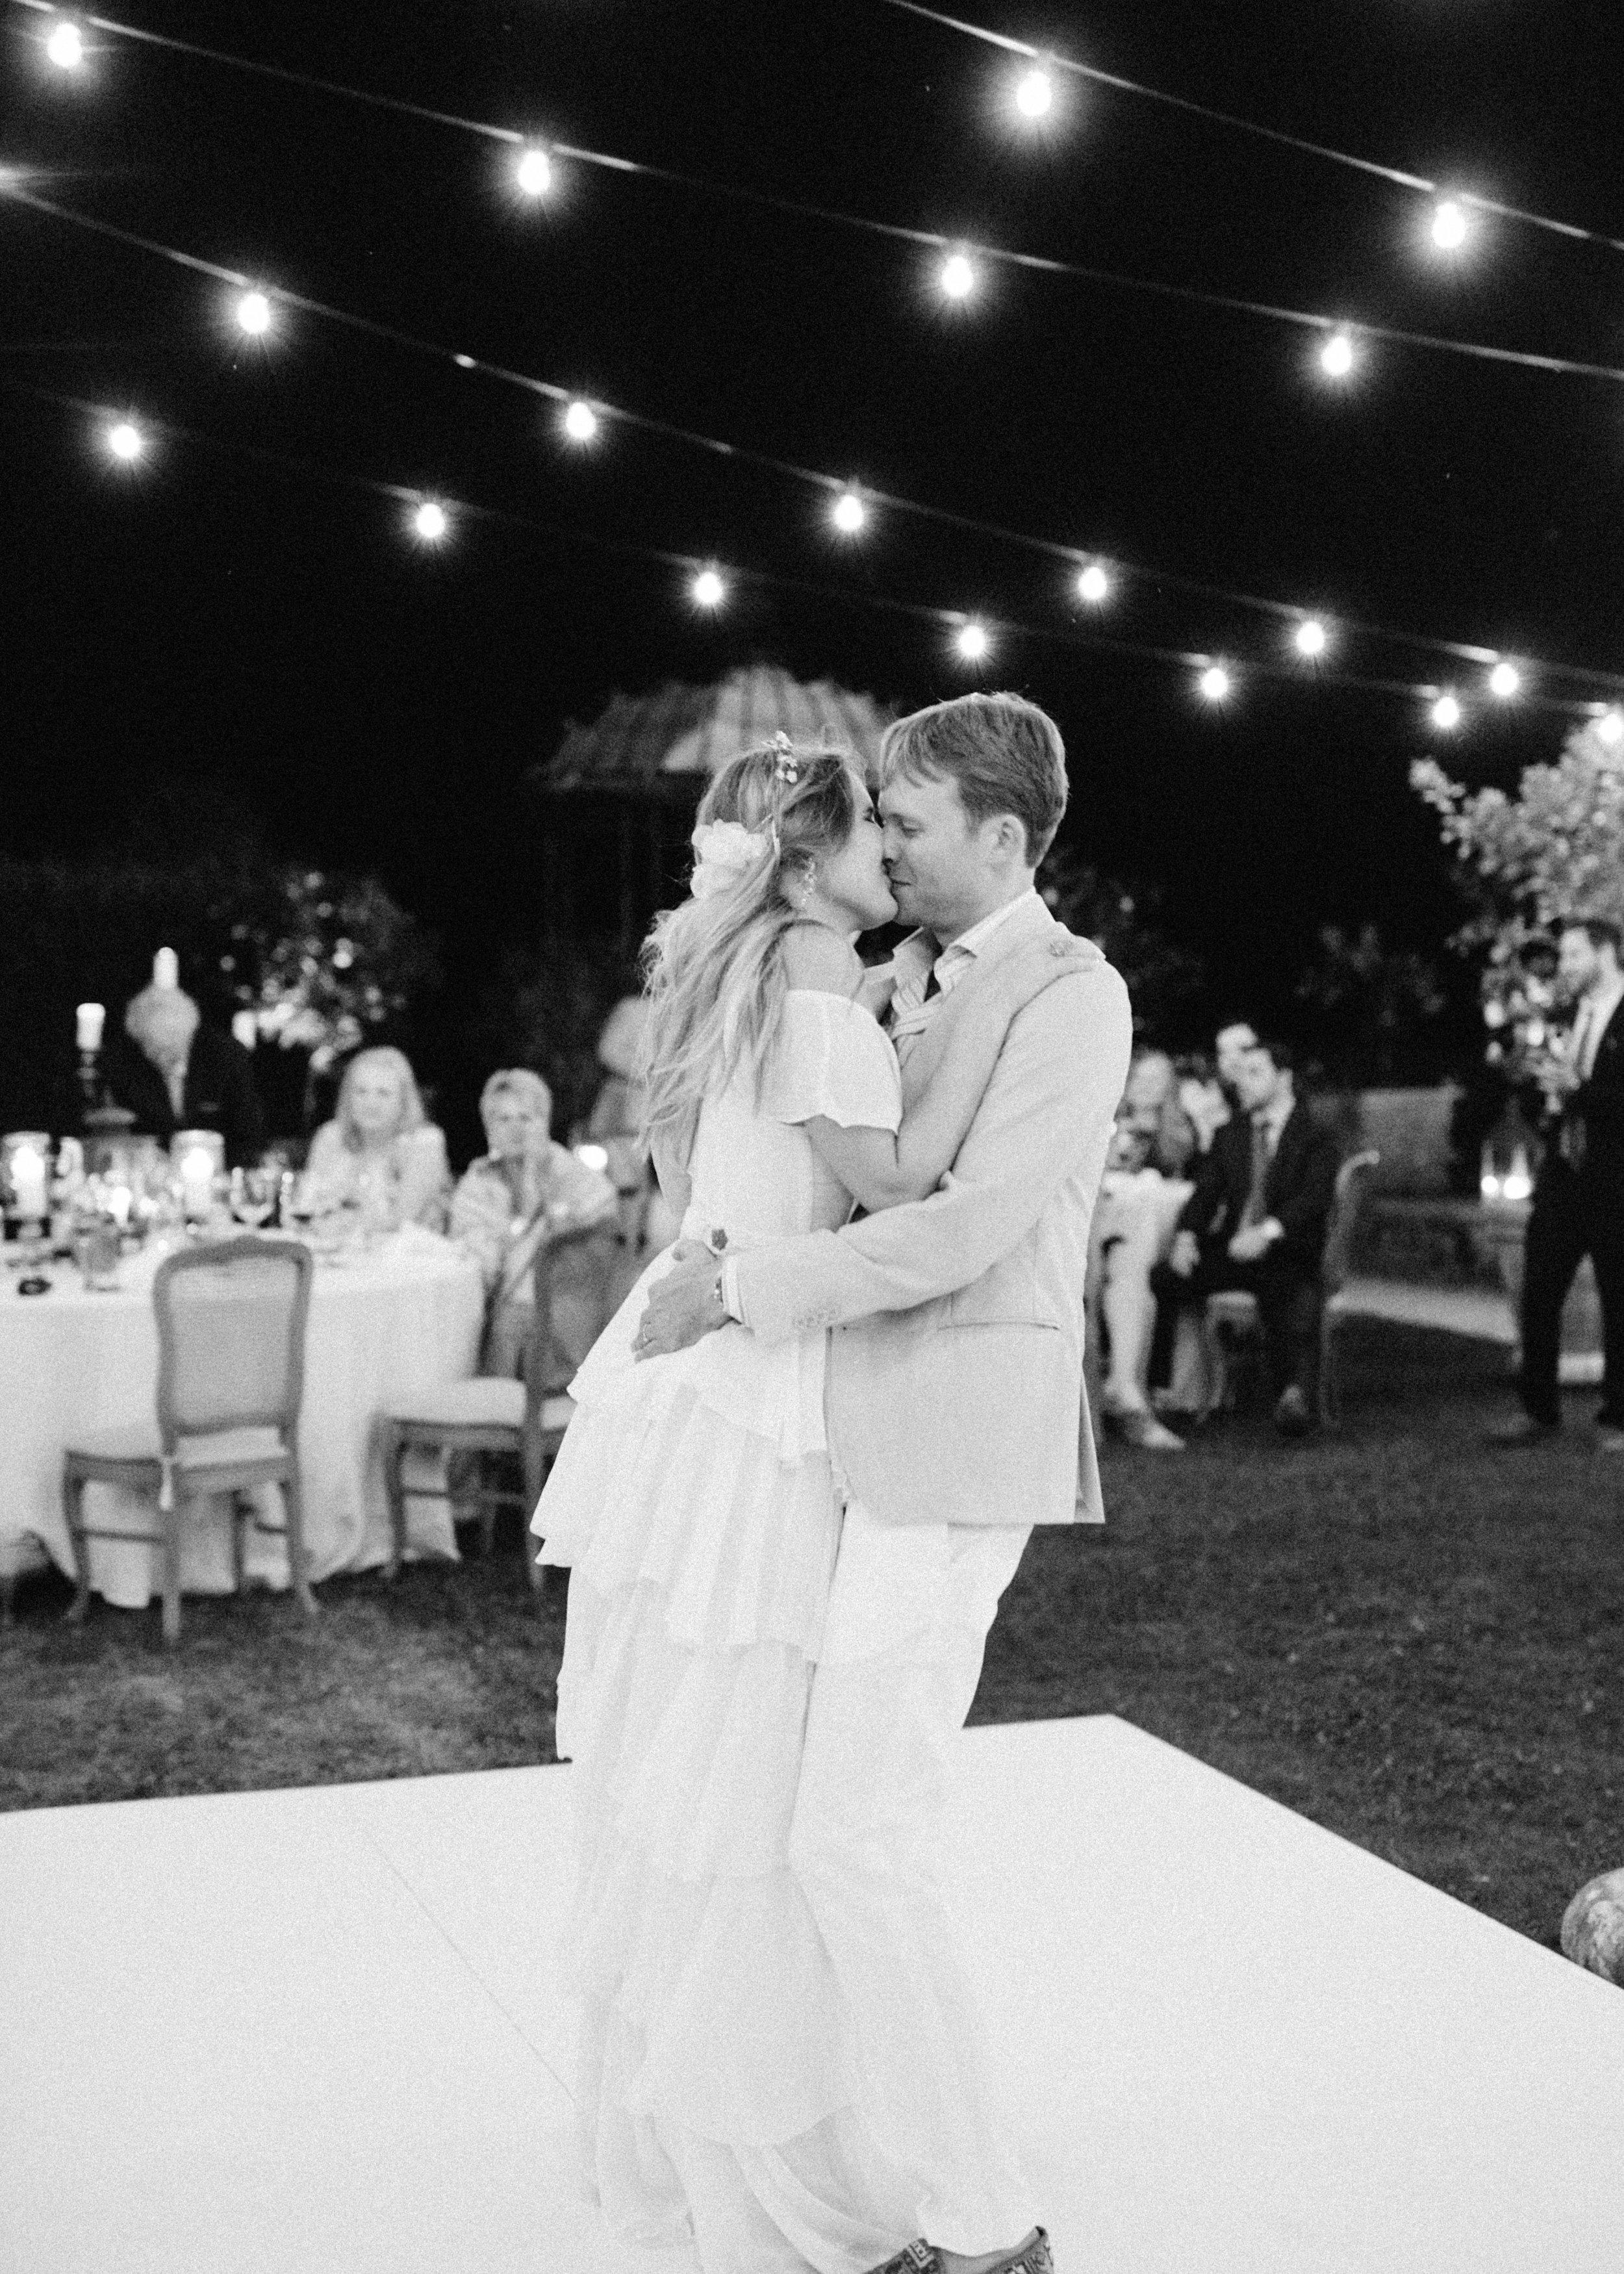 Kyle John l Fine Art Wedding Photography l Chicago, Copenhagen, California, New York, Destination l Blog l Alexis and Zach_Borgo Santo Pietro_Italy_Tuscany_78